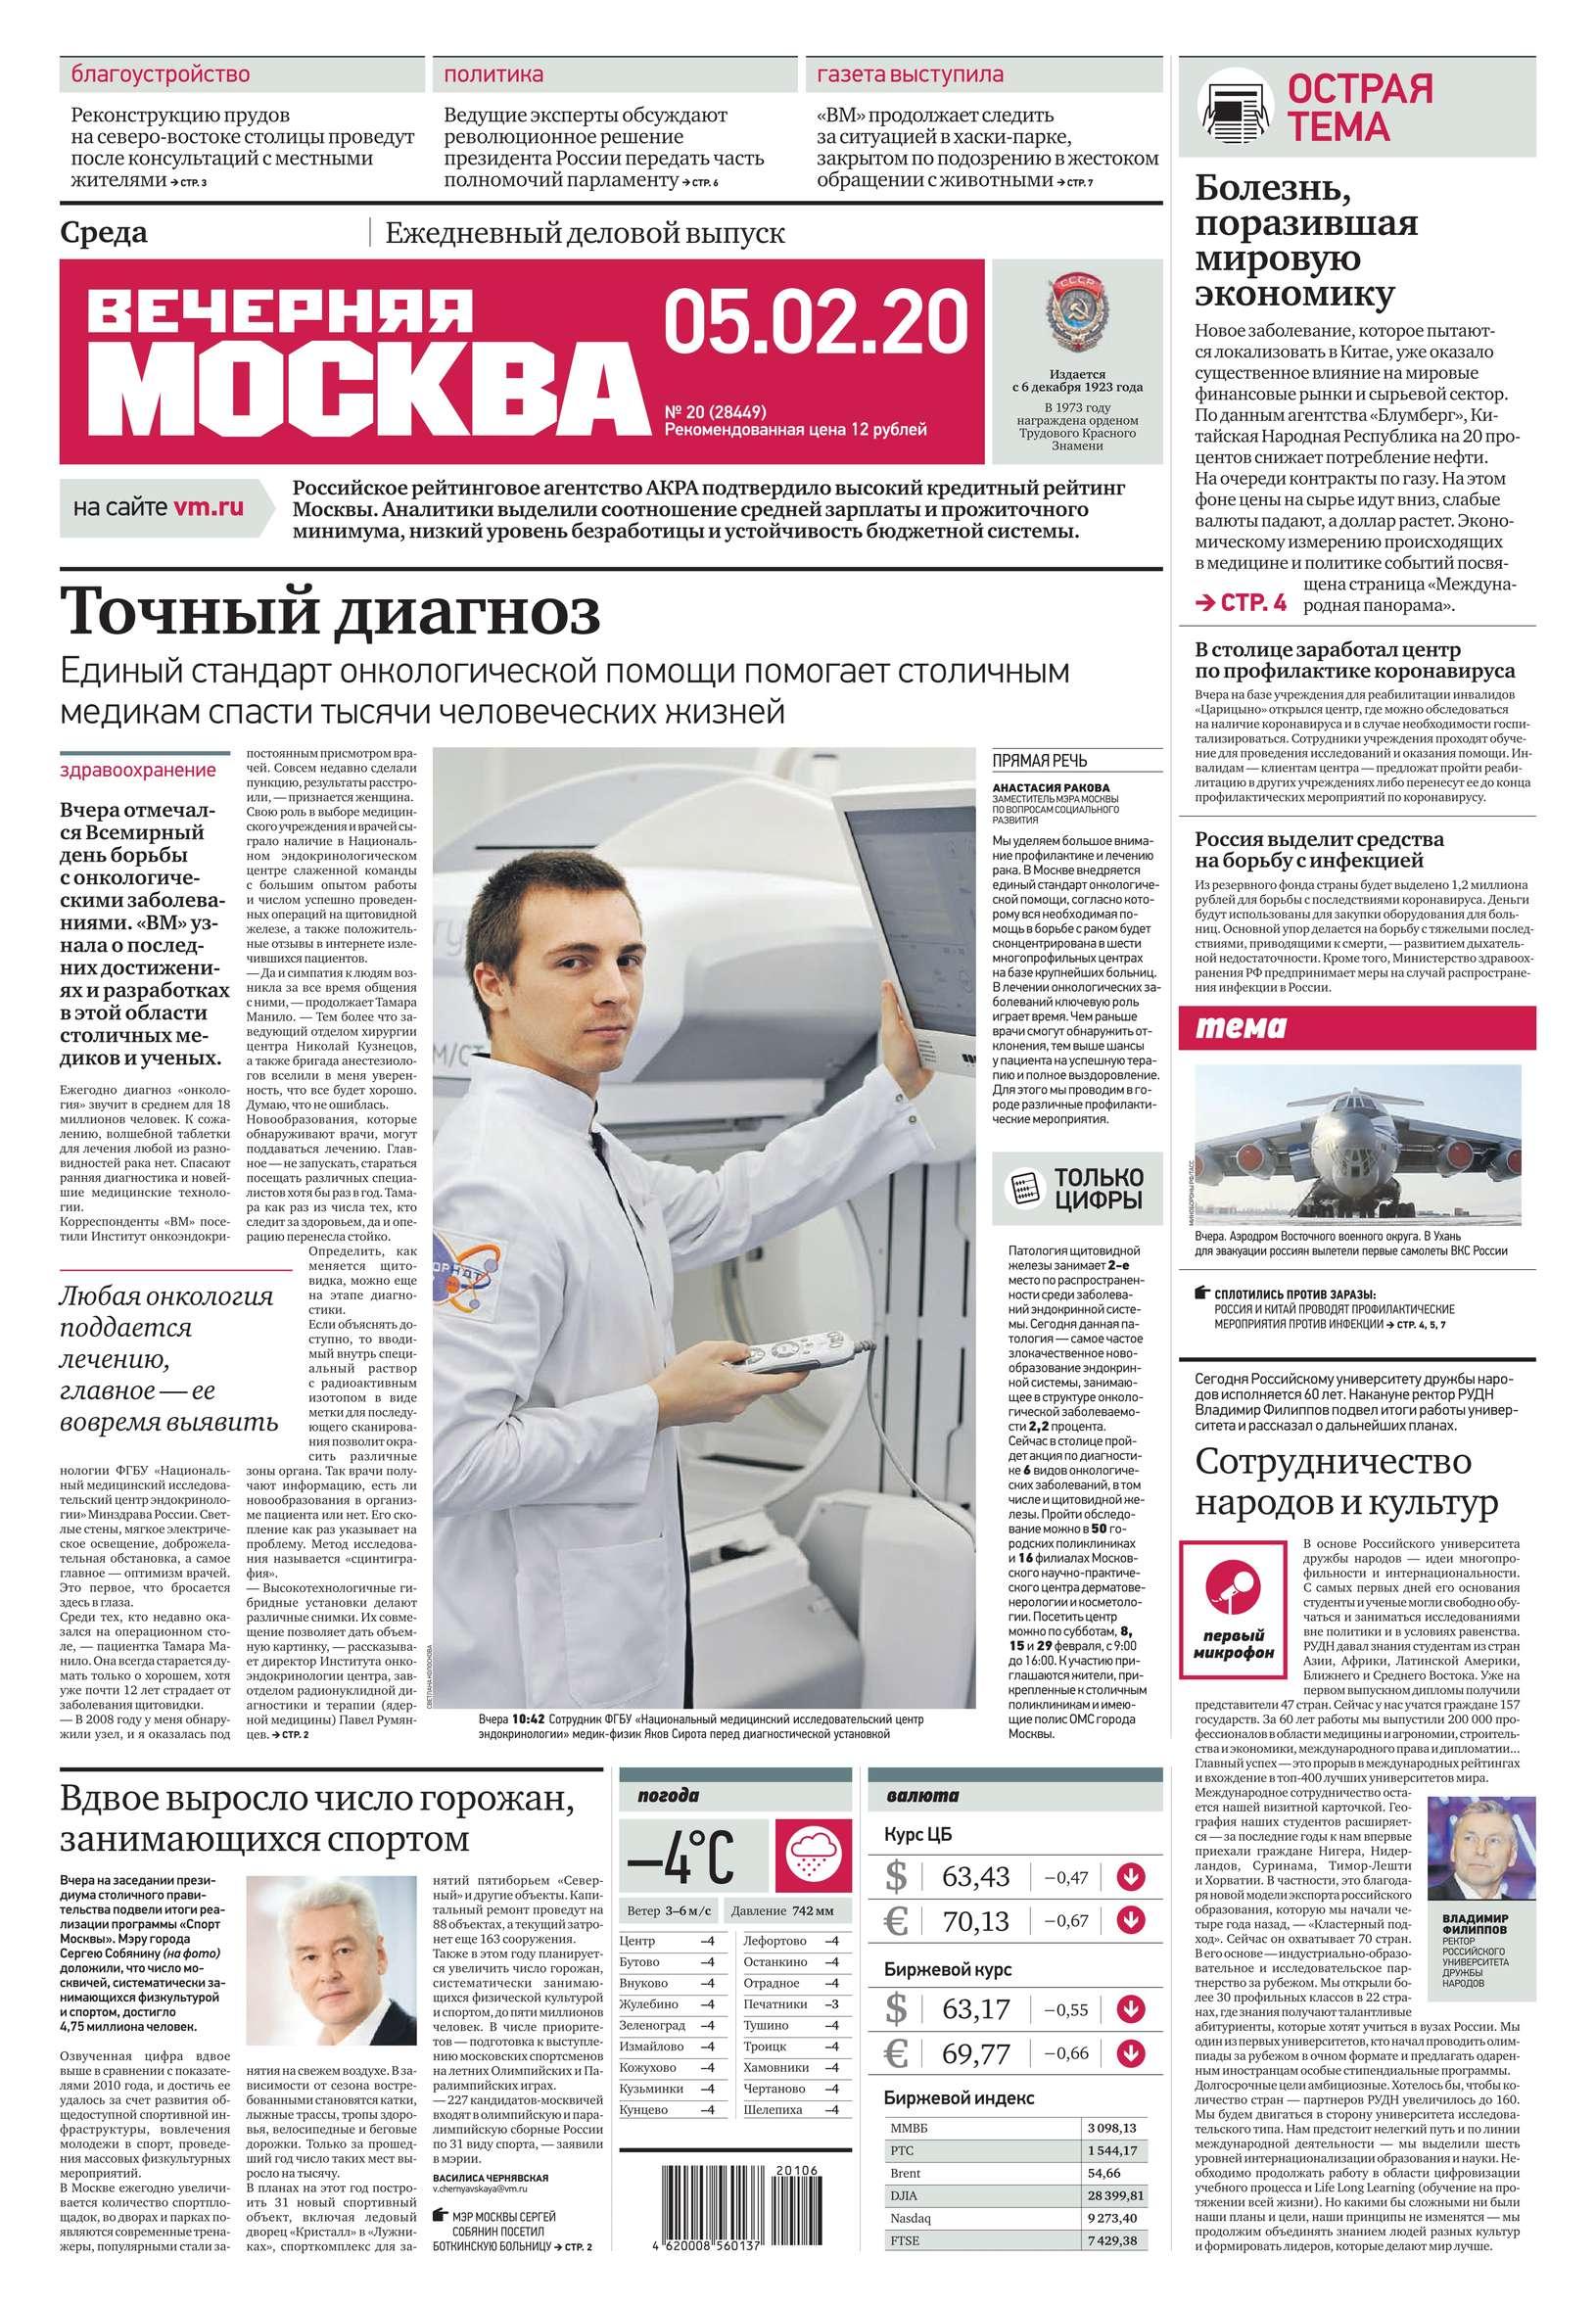 Редакция газеты Вечерняя Москва Вечерняя Москва 20-2020